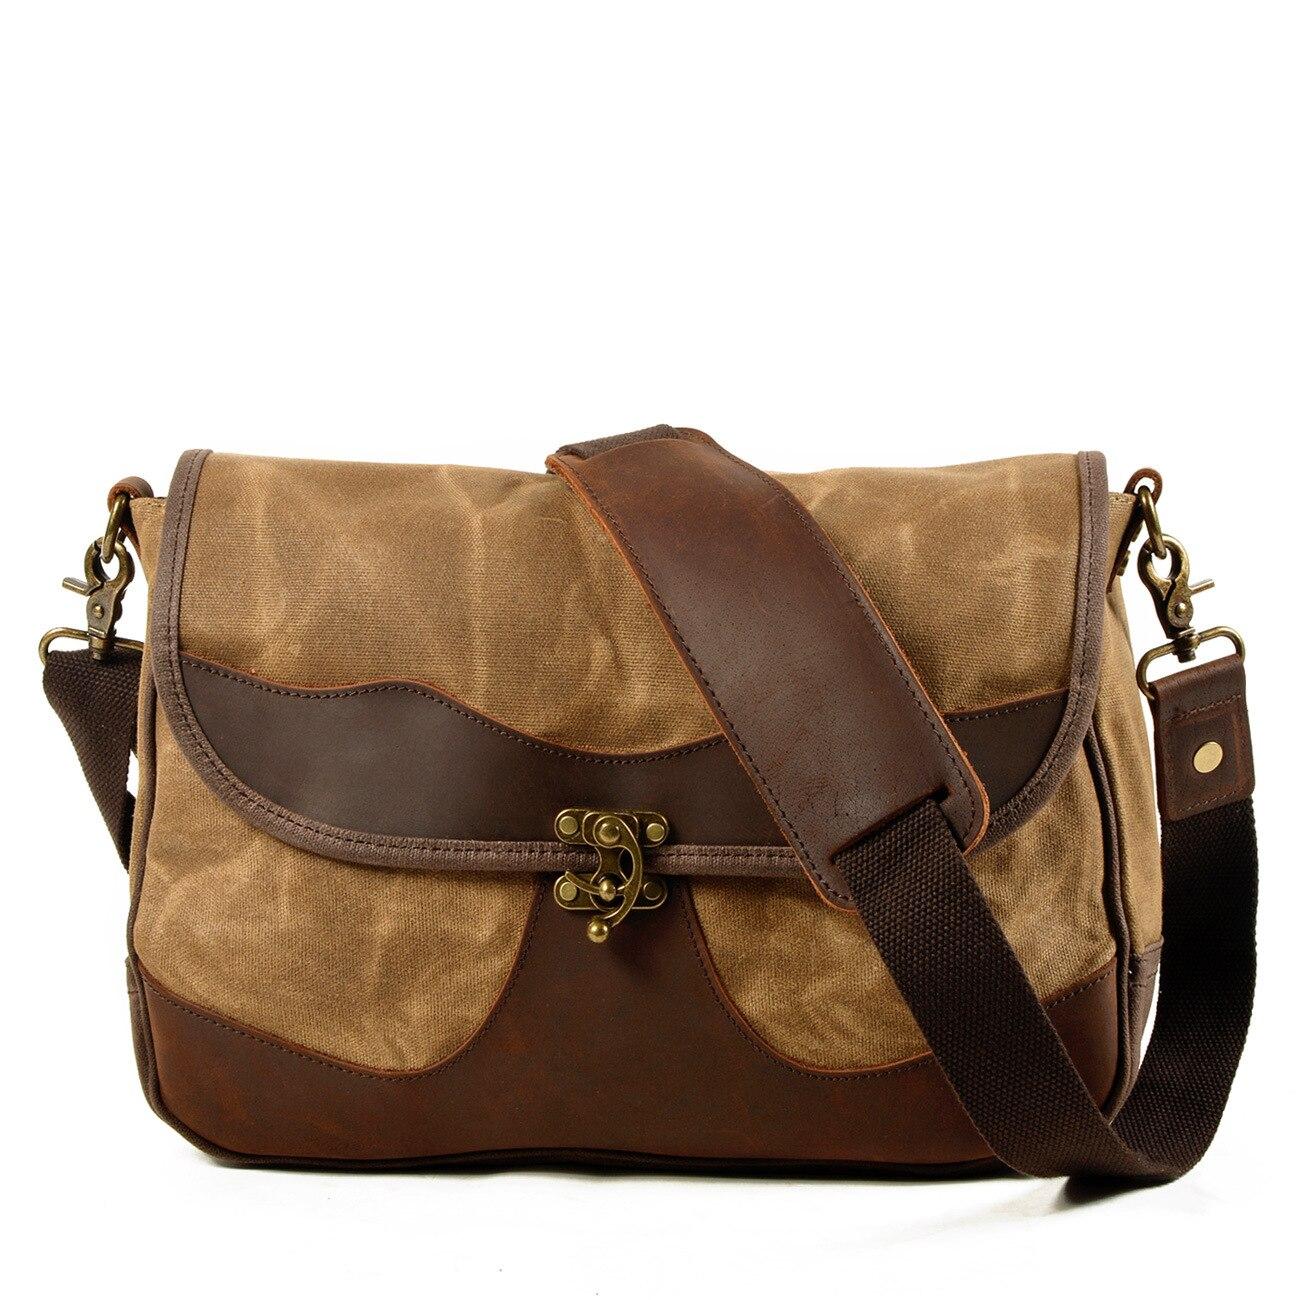 Bolso de hombro Retro de lona para hombre, nuevo estilo, bolso de ordenador portátil para exterior a la moda, bolso de sillín informal de piel de vaca Camel